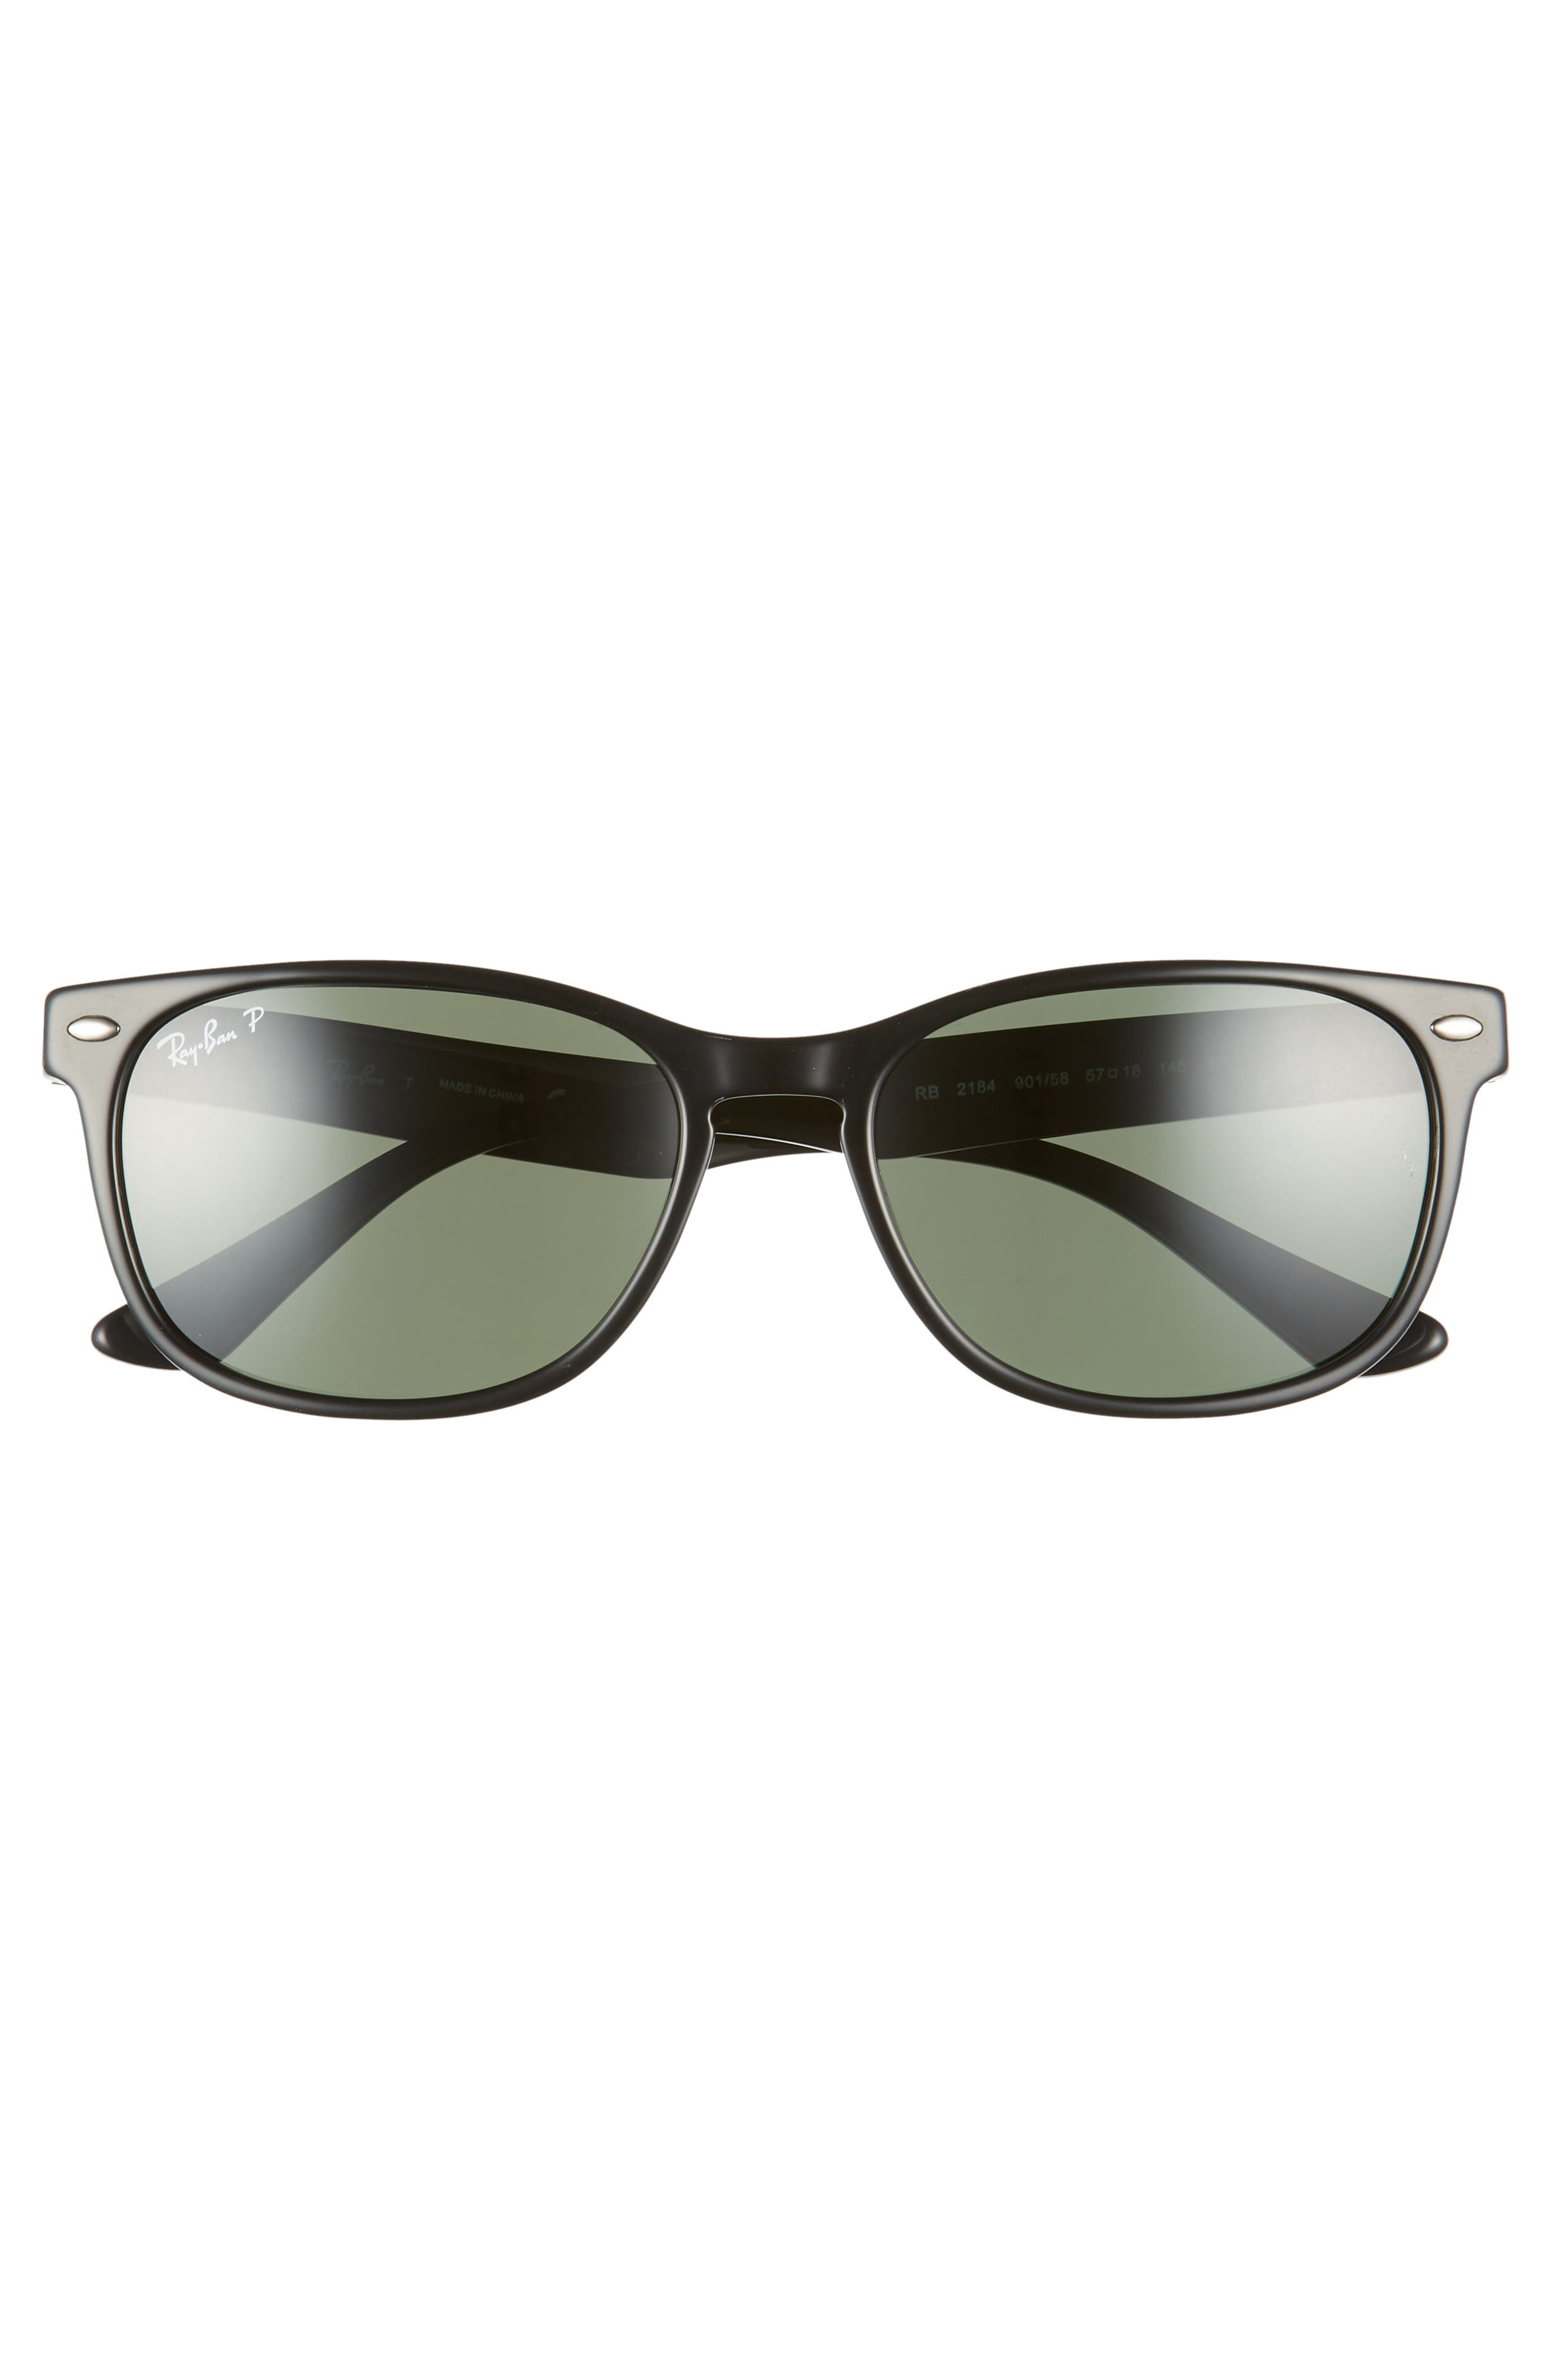 57mm Wayfarer Polarized Sunglasses,                             Alternate thumbnail 3, color,                             BLACK/ GREEN SOLID